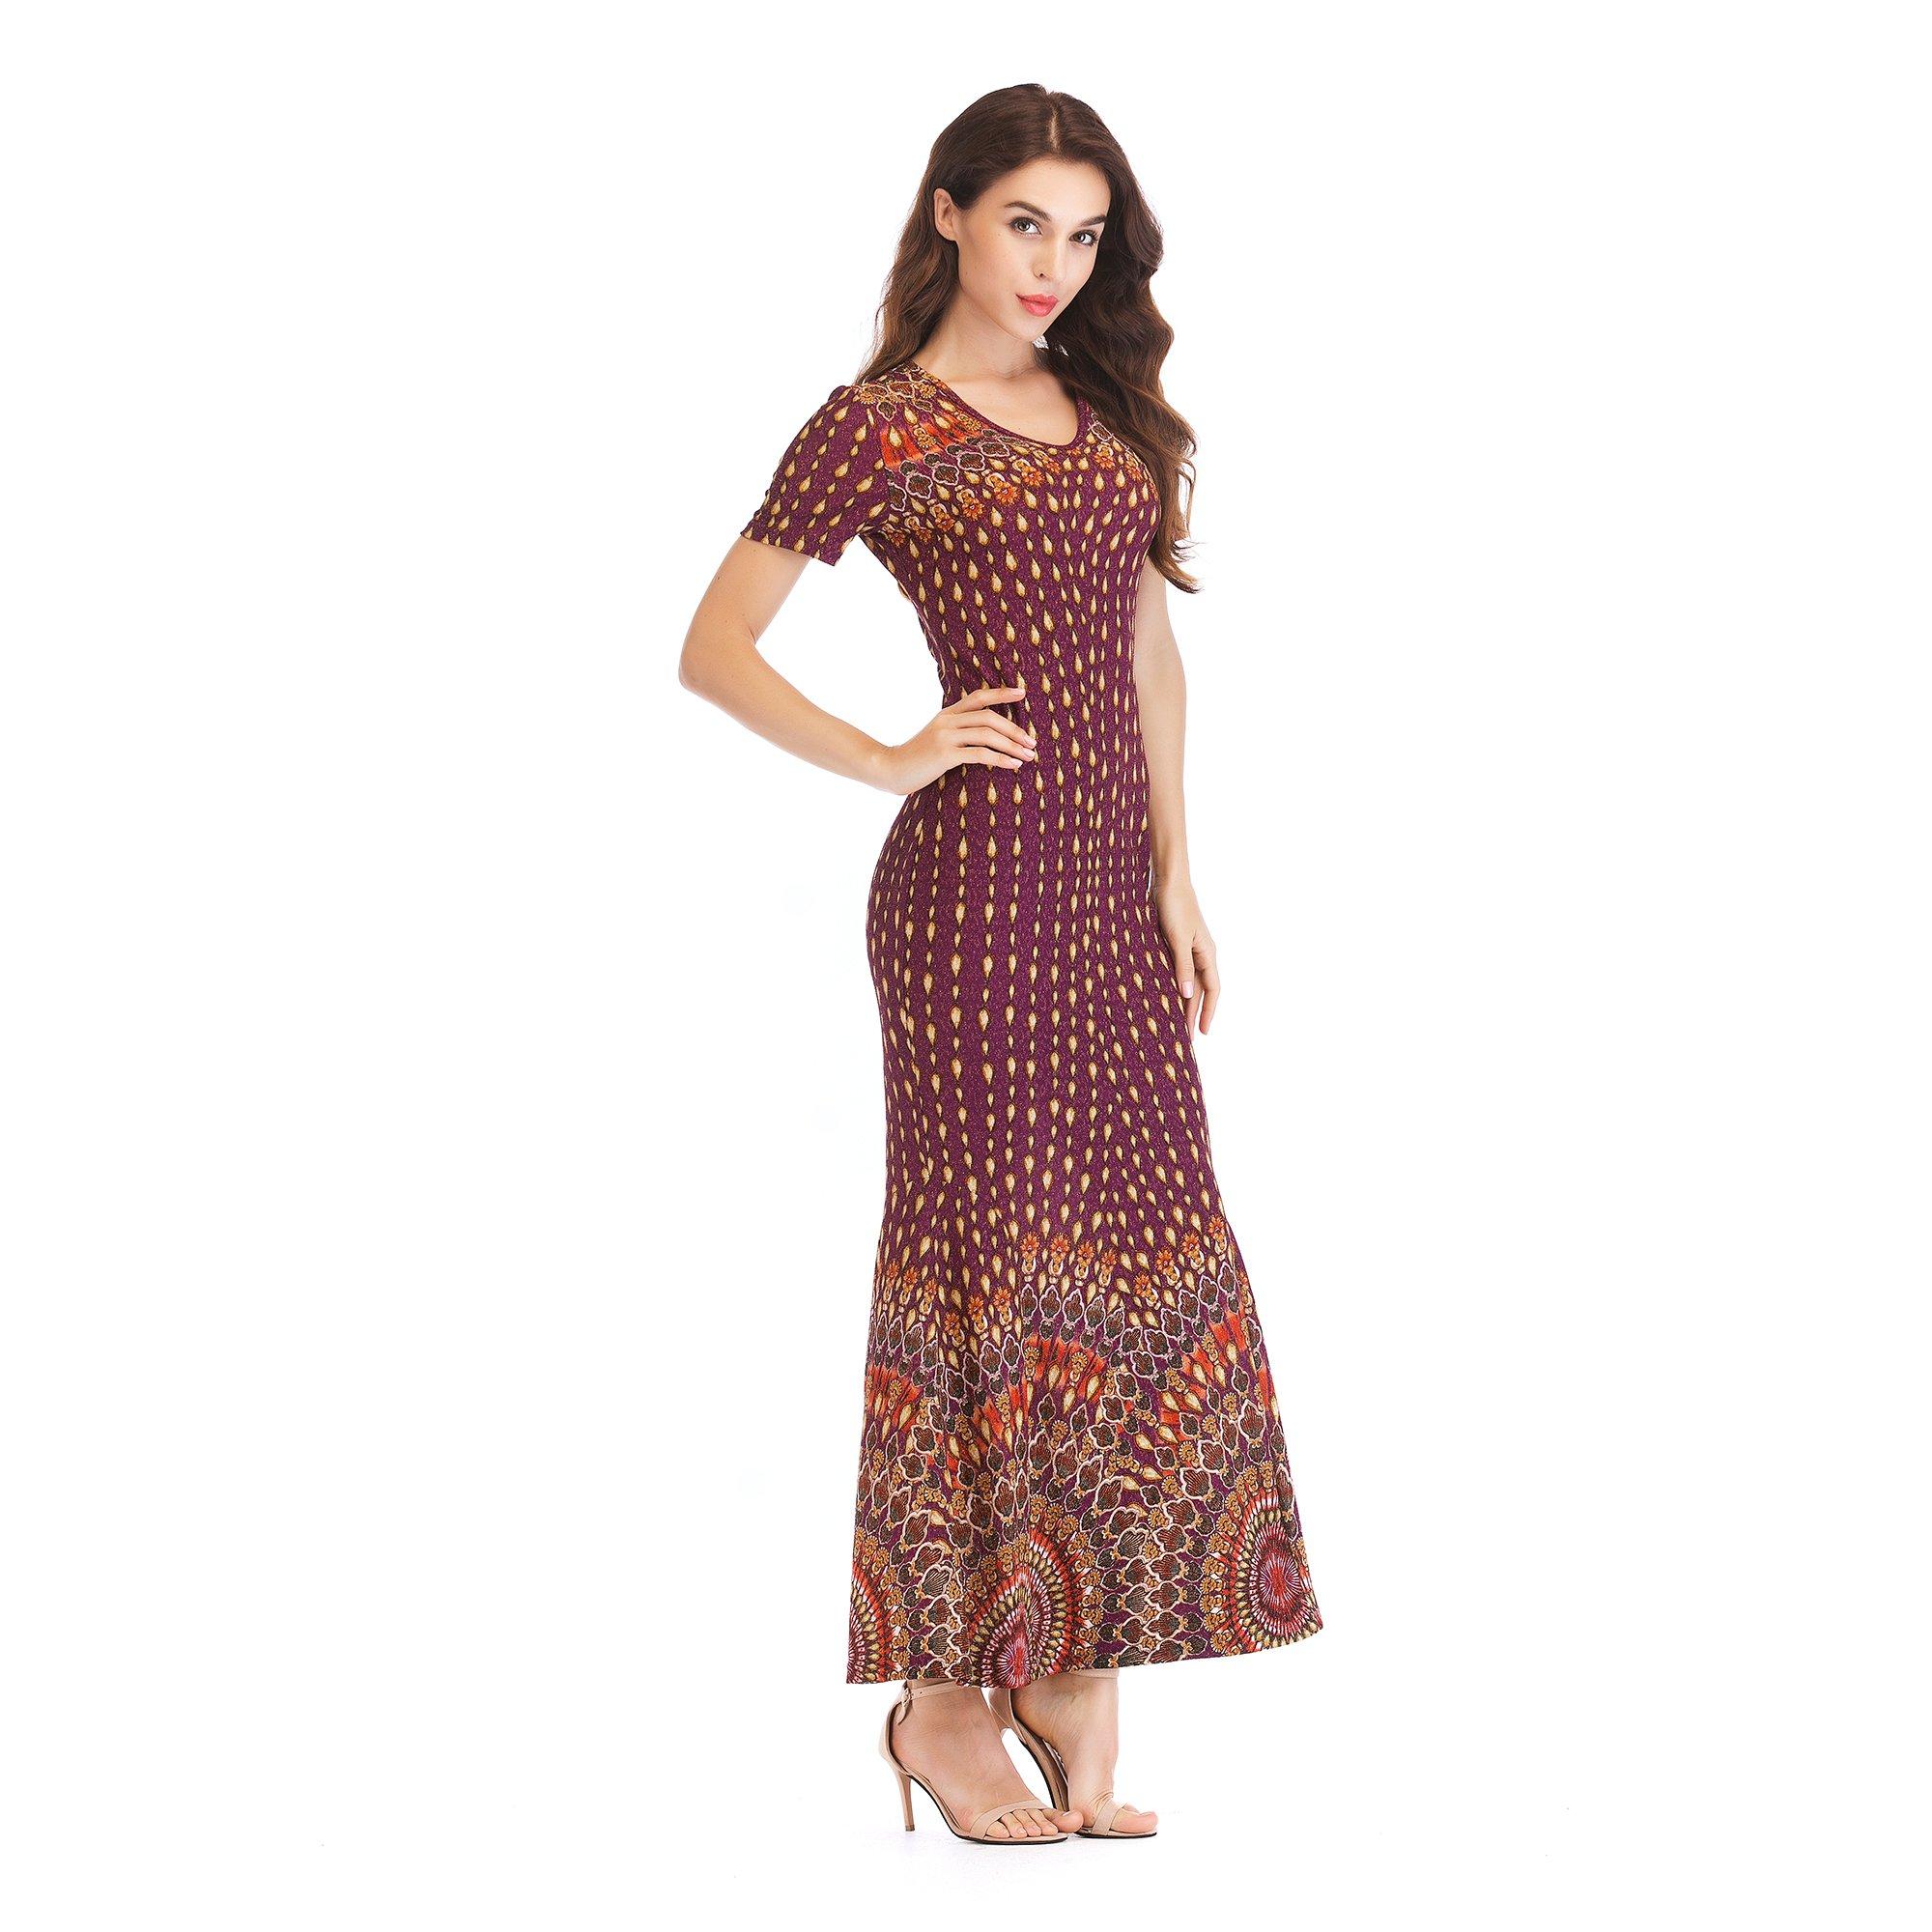 Cy1983 Women's Knit V-Neck Bag Hip Slim Long Dress Positioning Fishtail Skirt (Large, Purple)